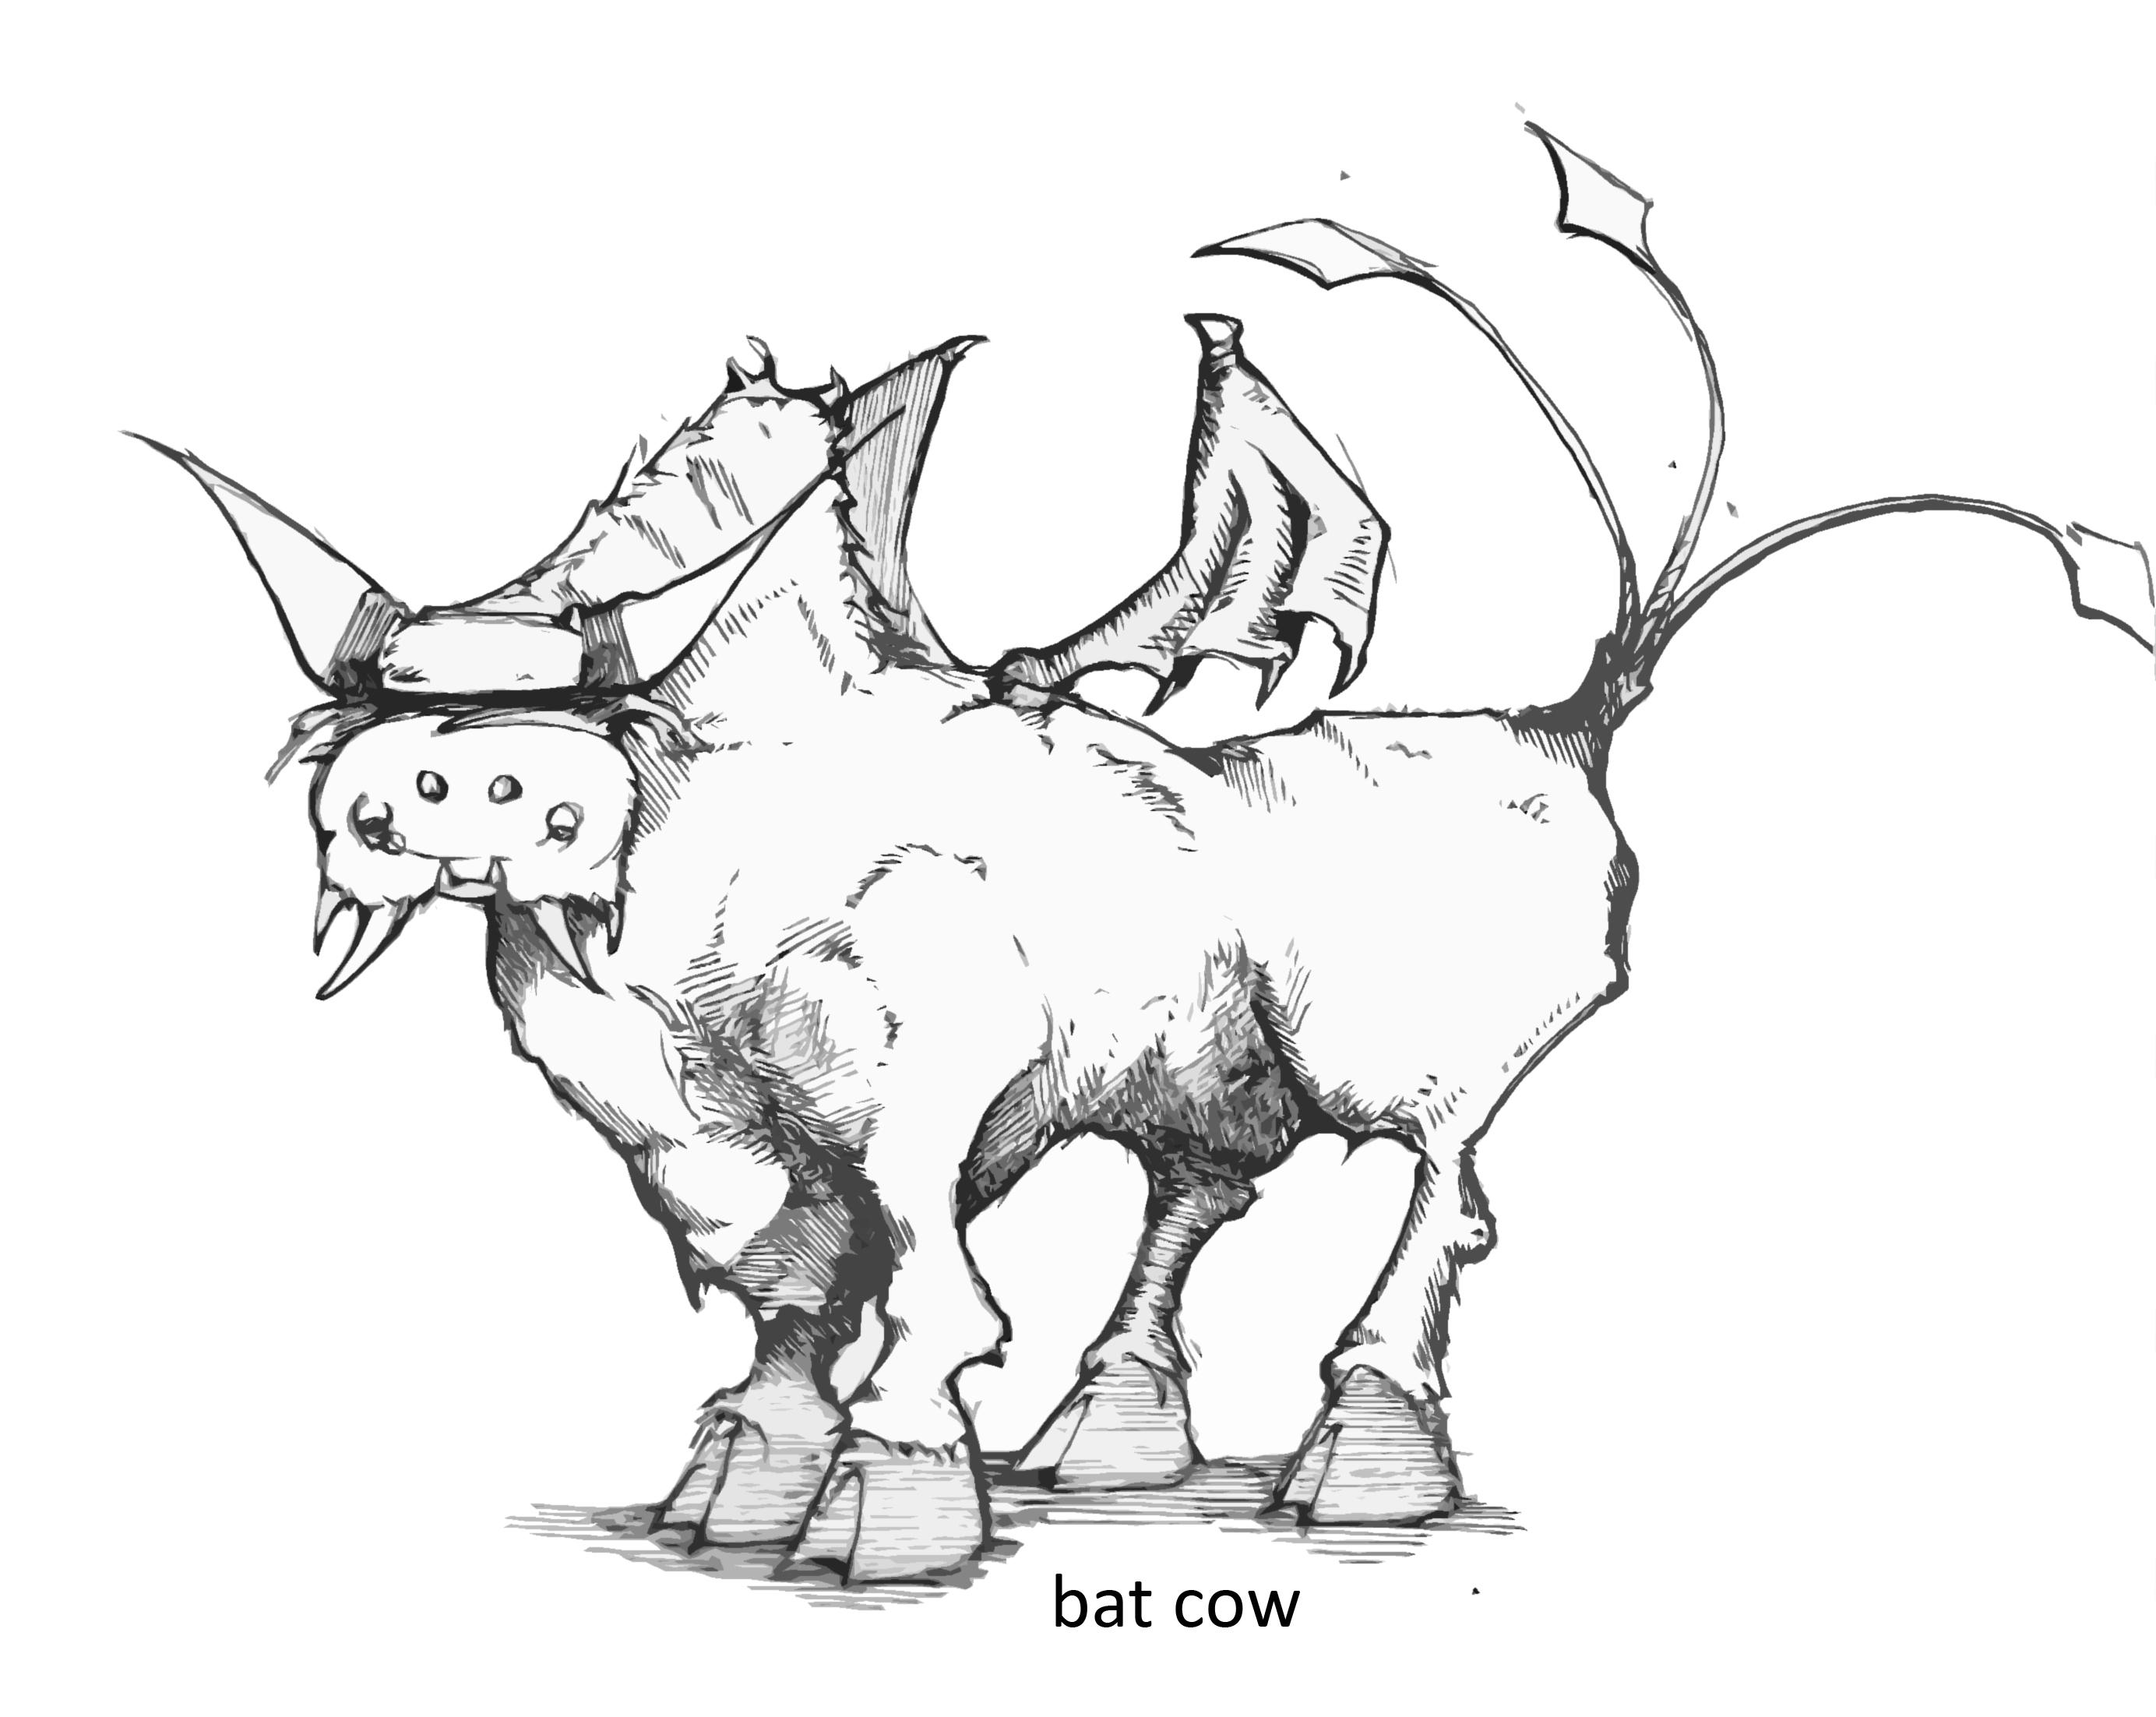 batCow